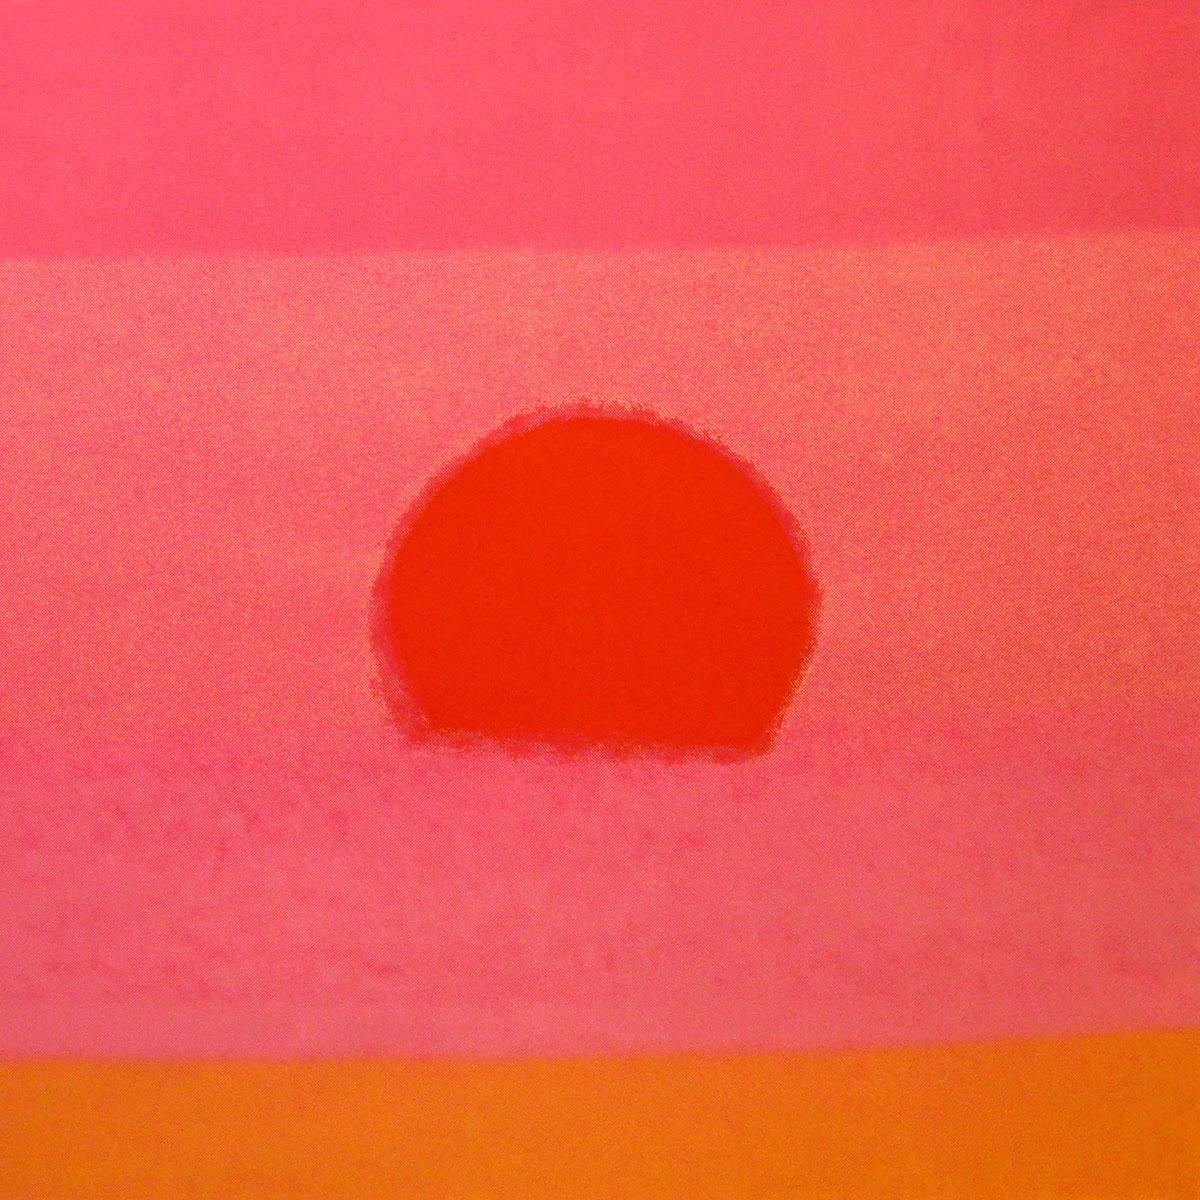 Sunset 88 Orange by Andy Warhol